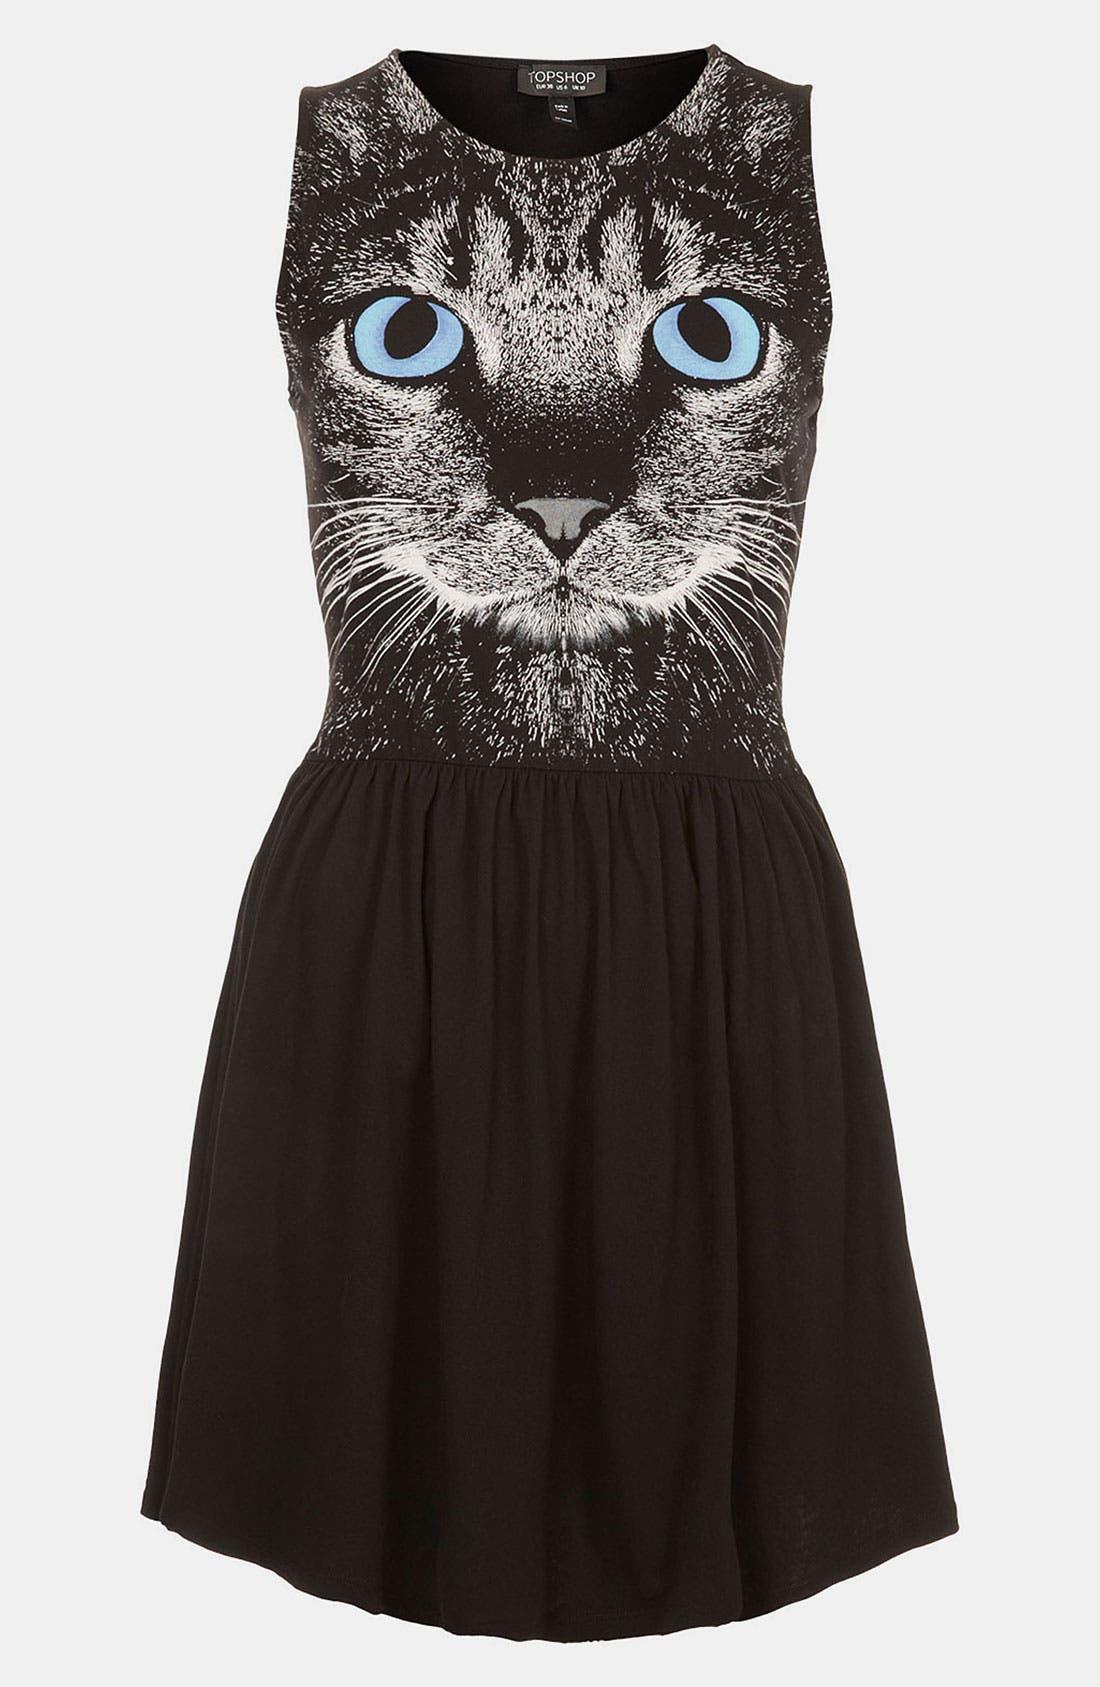 Main Image - Topshop Cat Graphic Skater Dress